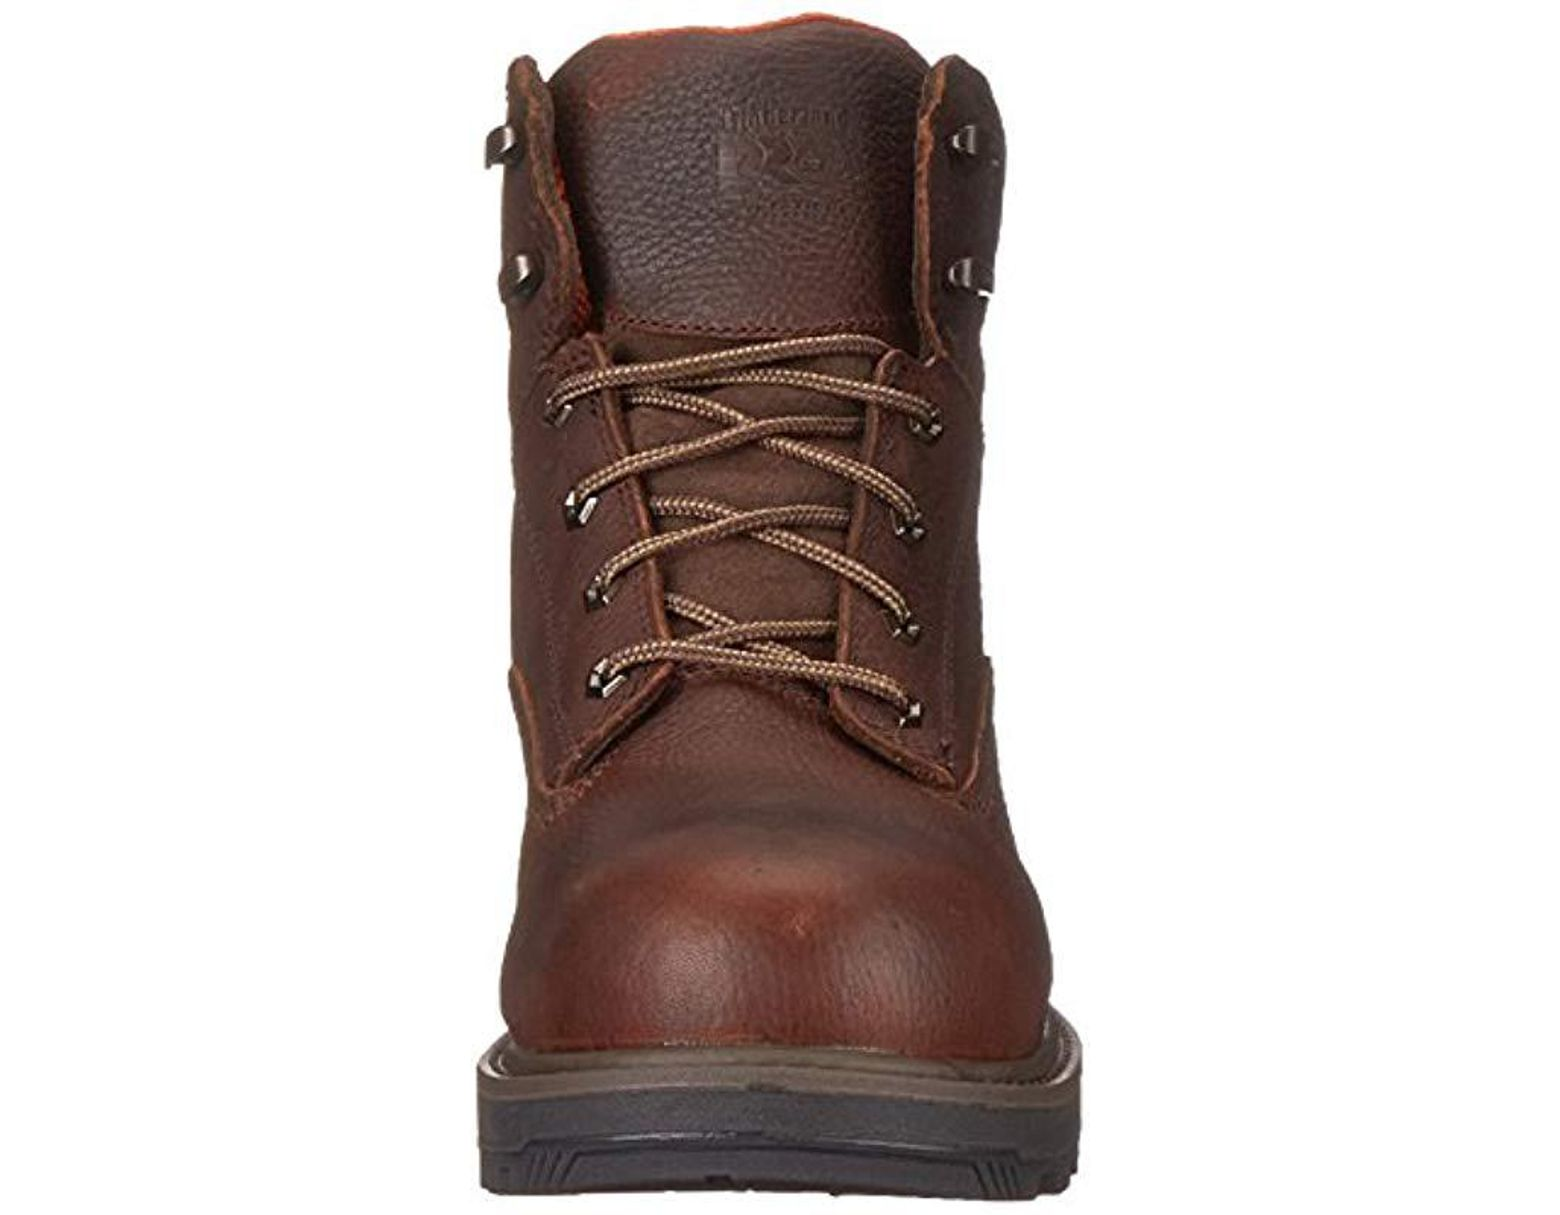 b4441b60dd9 Men's Brown 6